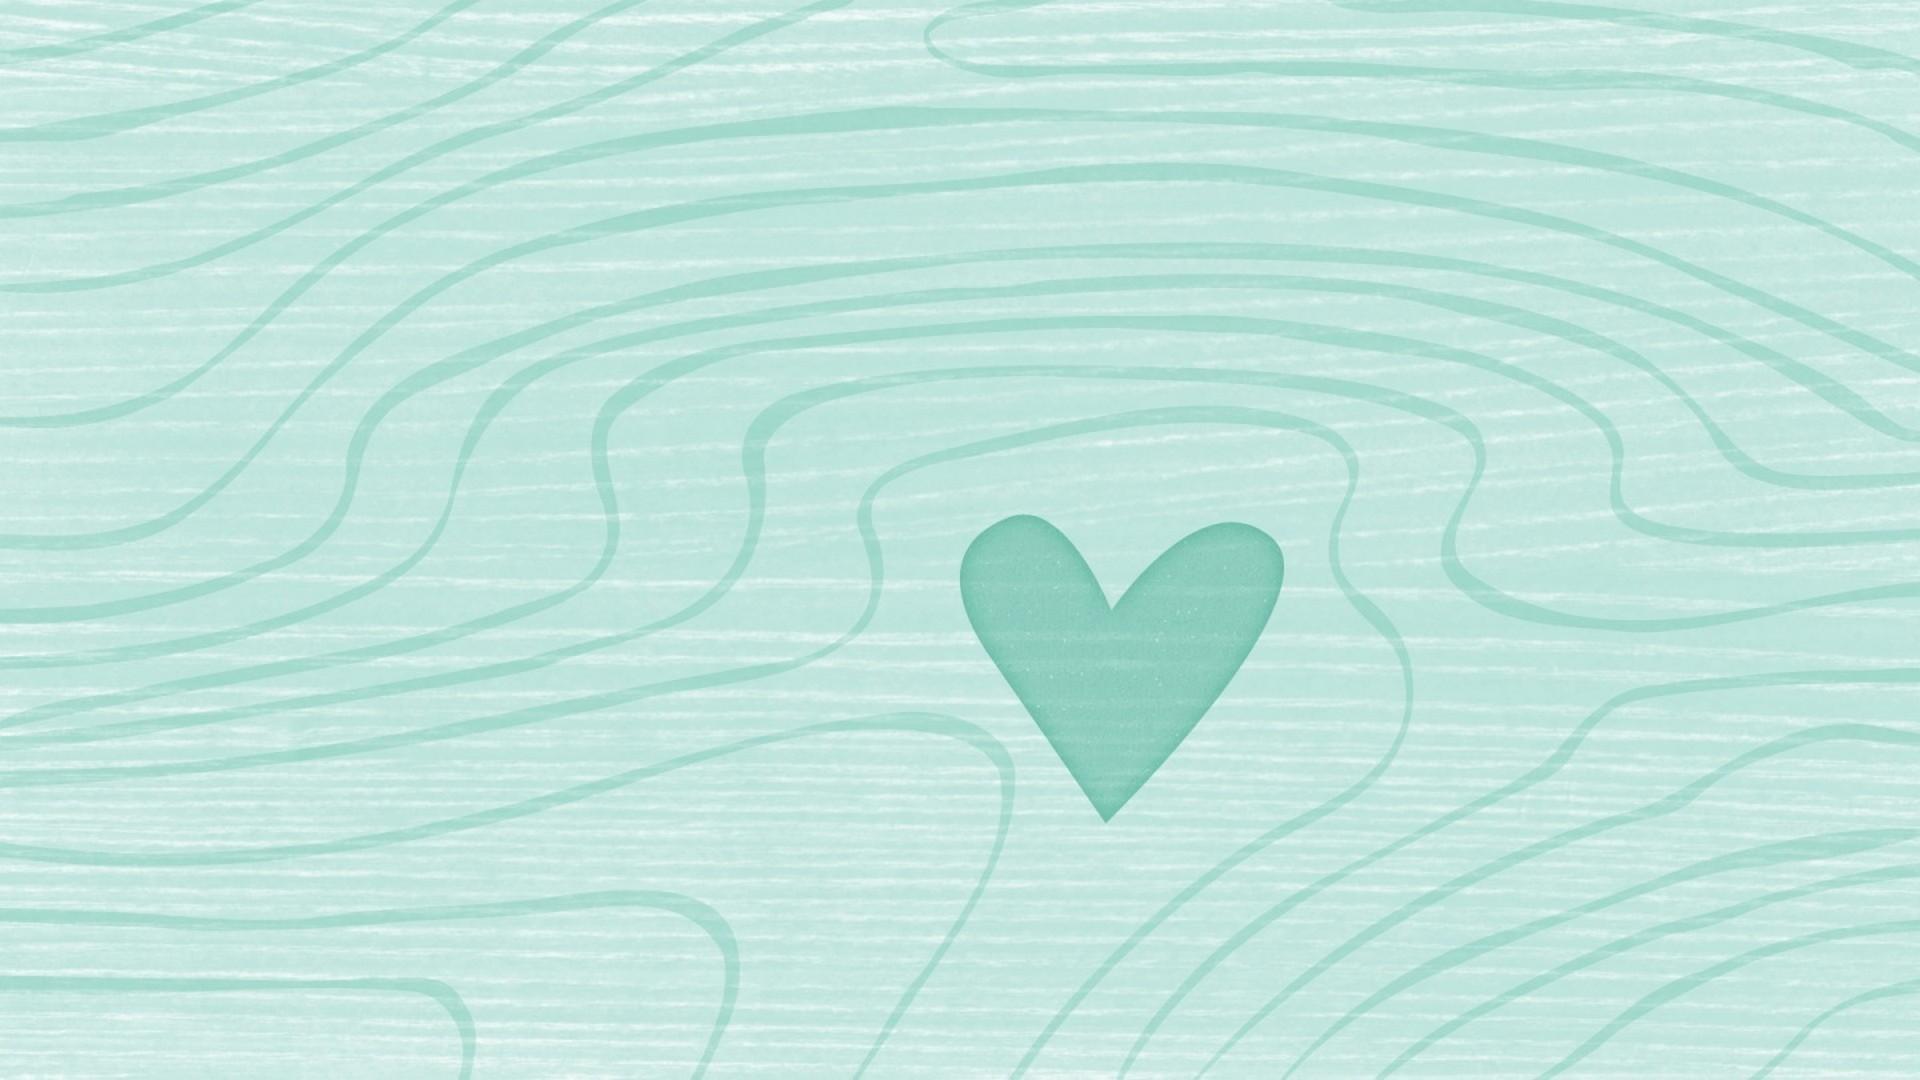 Cute Wallpapers Green Mint Best Mint Green Wallpaper 2020 Cute Wallpapers